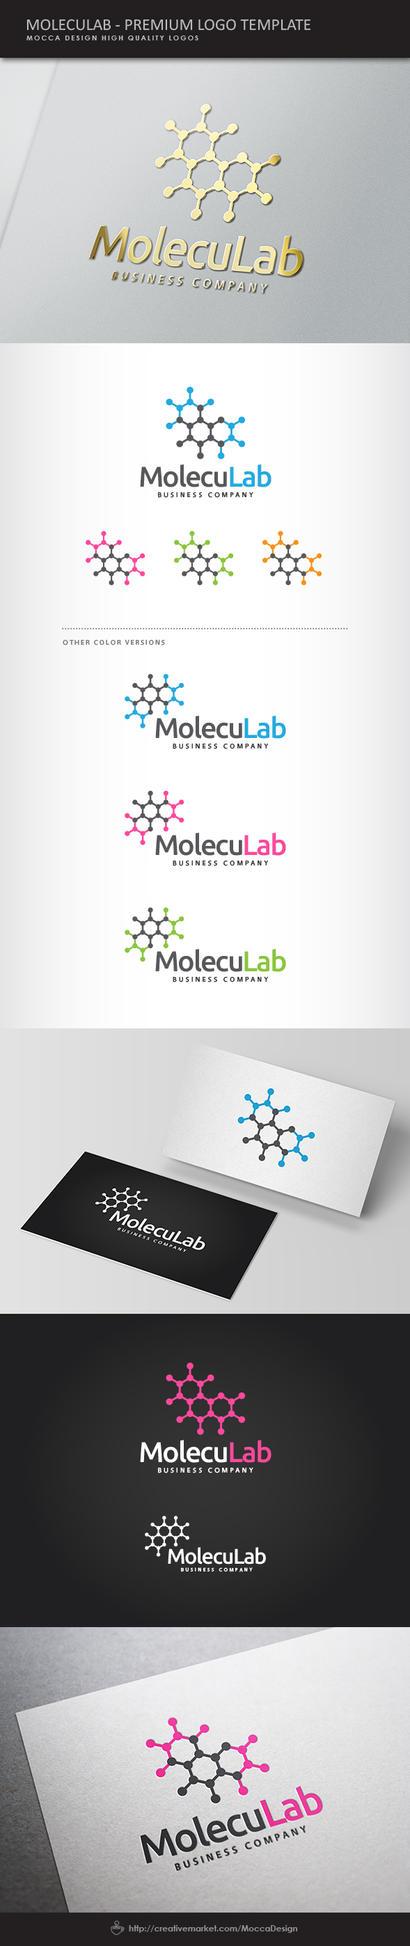 Moleculab Logo by moccadsgn